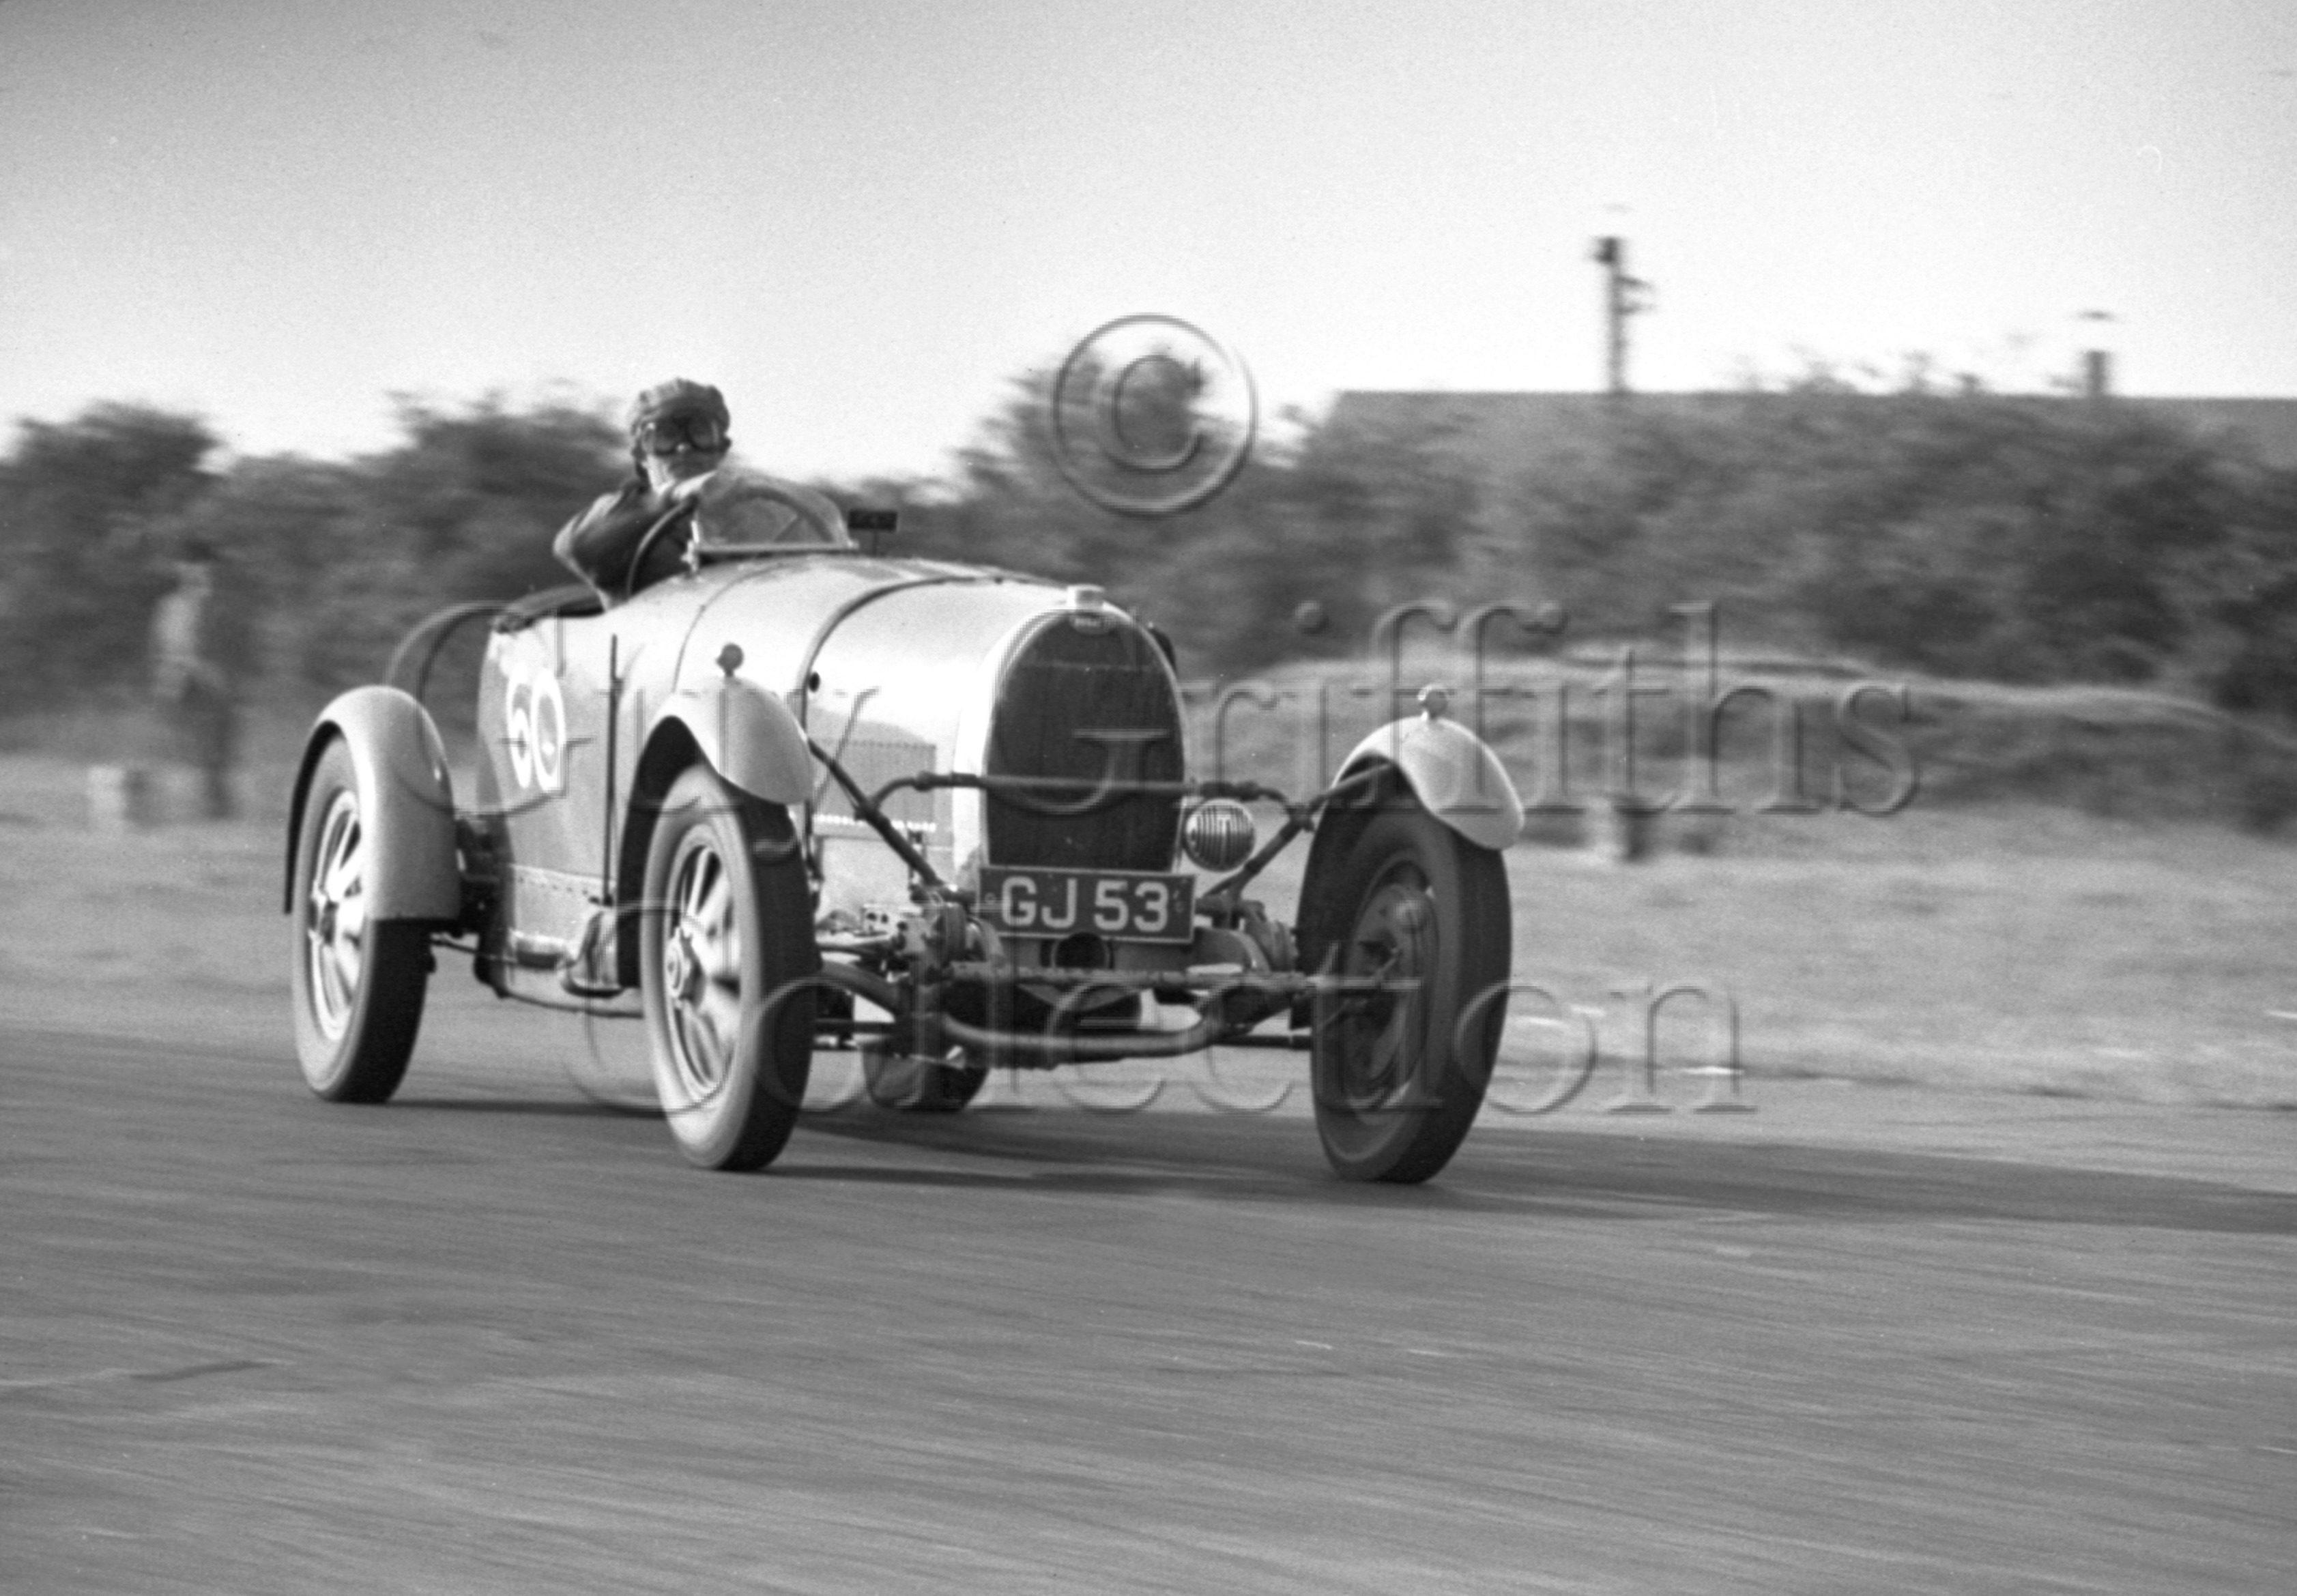 48-964–B-Wyatt–Bugatti–Snetterton–27-10-1951.jpg - The Guy Griffiths Collection